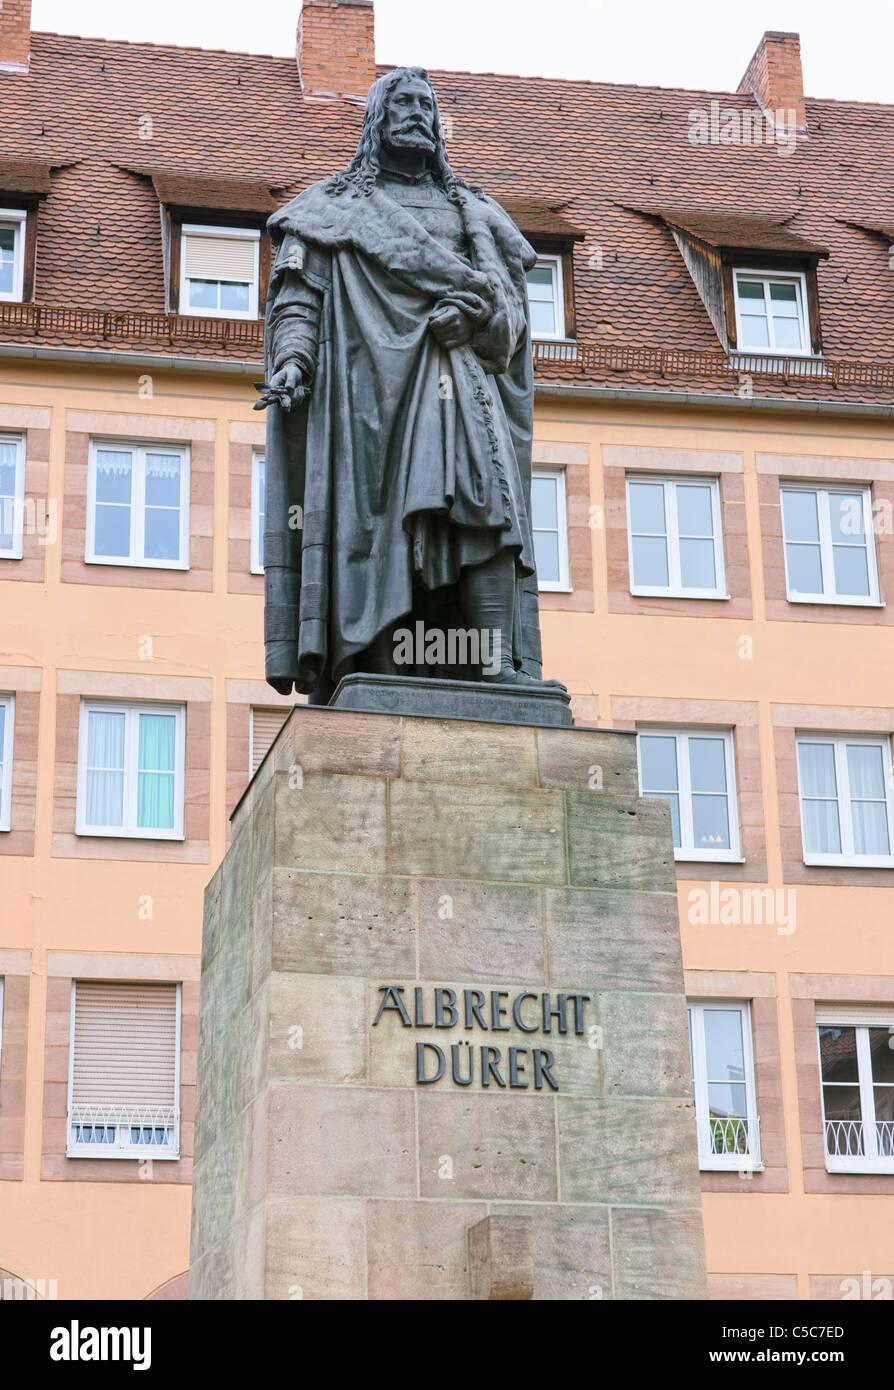 Albrecht Dürer Skulptur Nürnberg Bayern Deutschland Stockbild